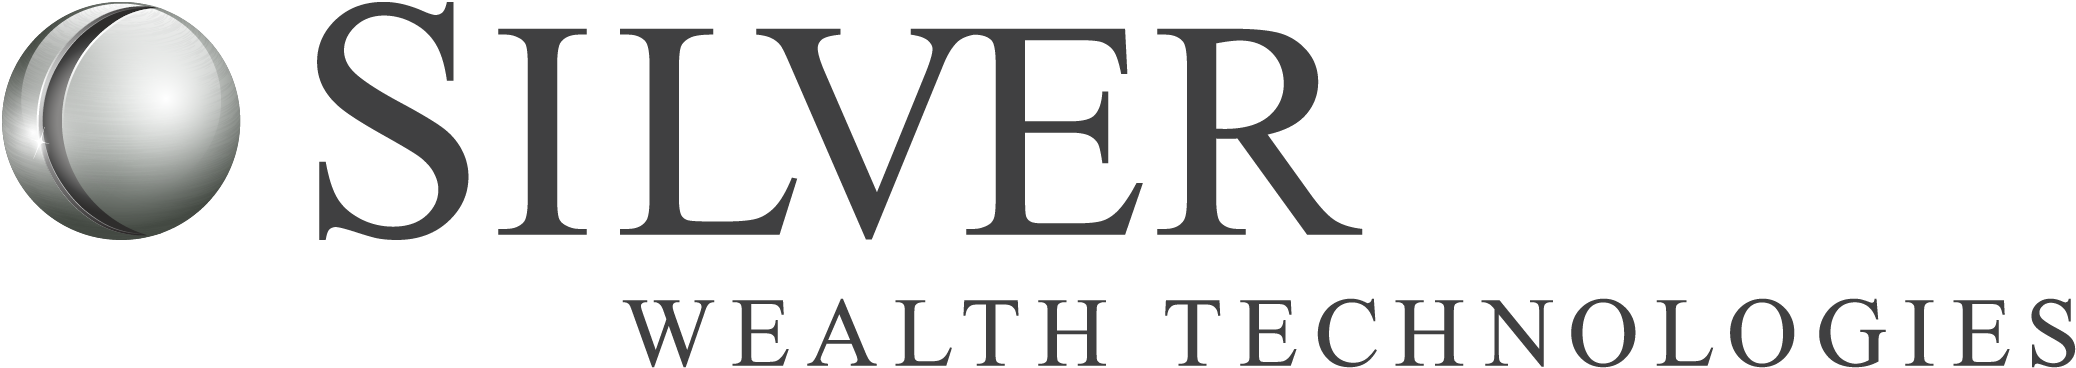 Silver Wealth Technologies